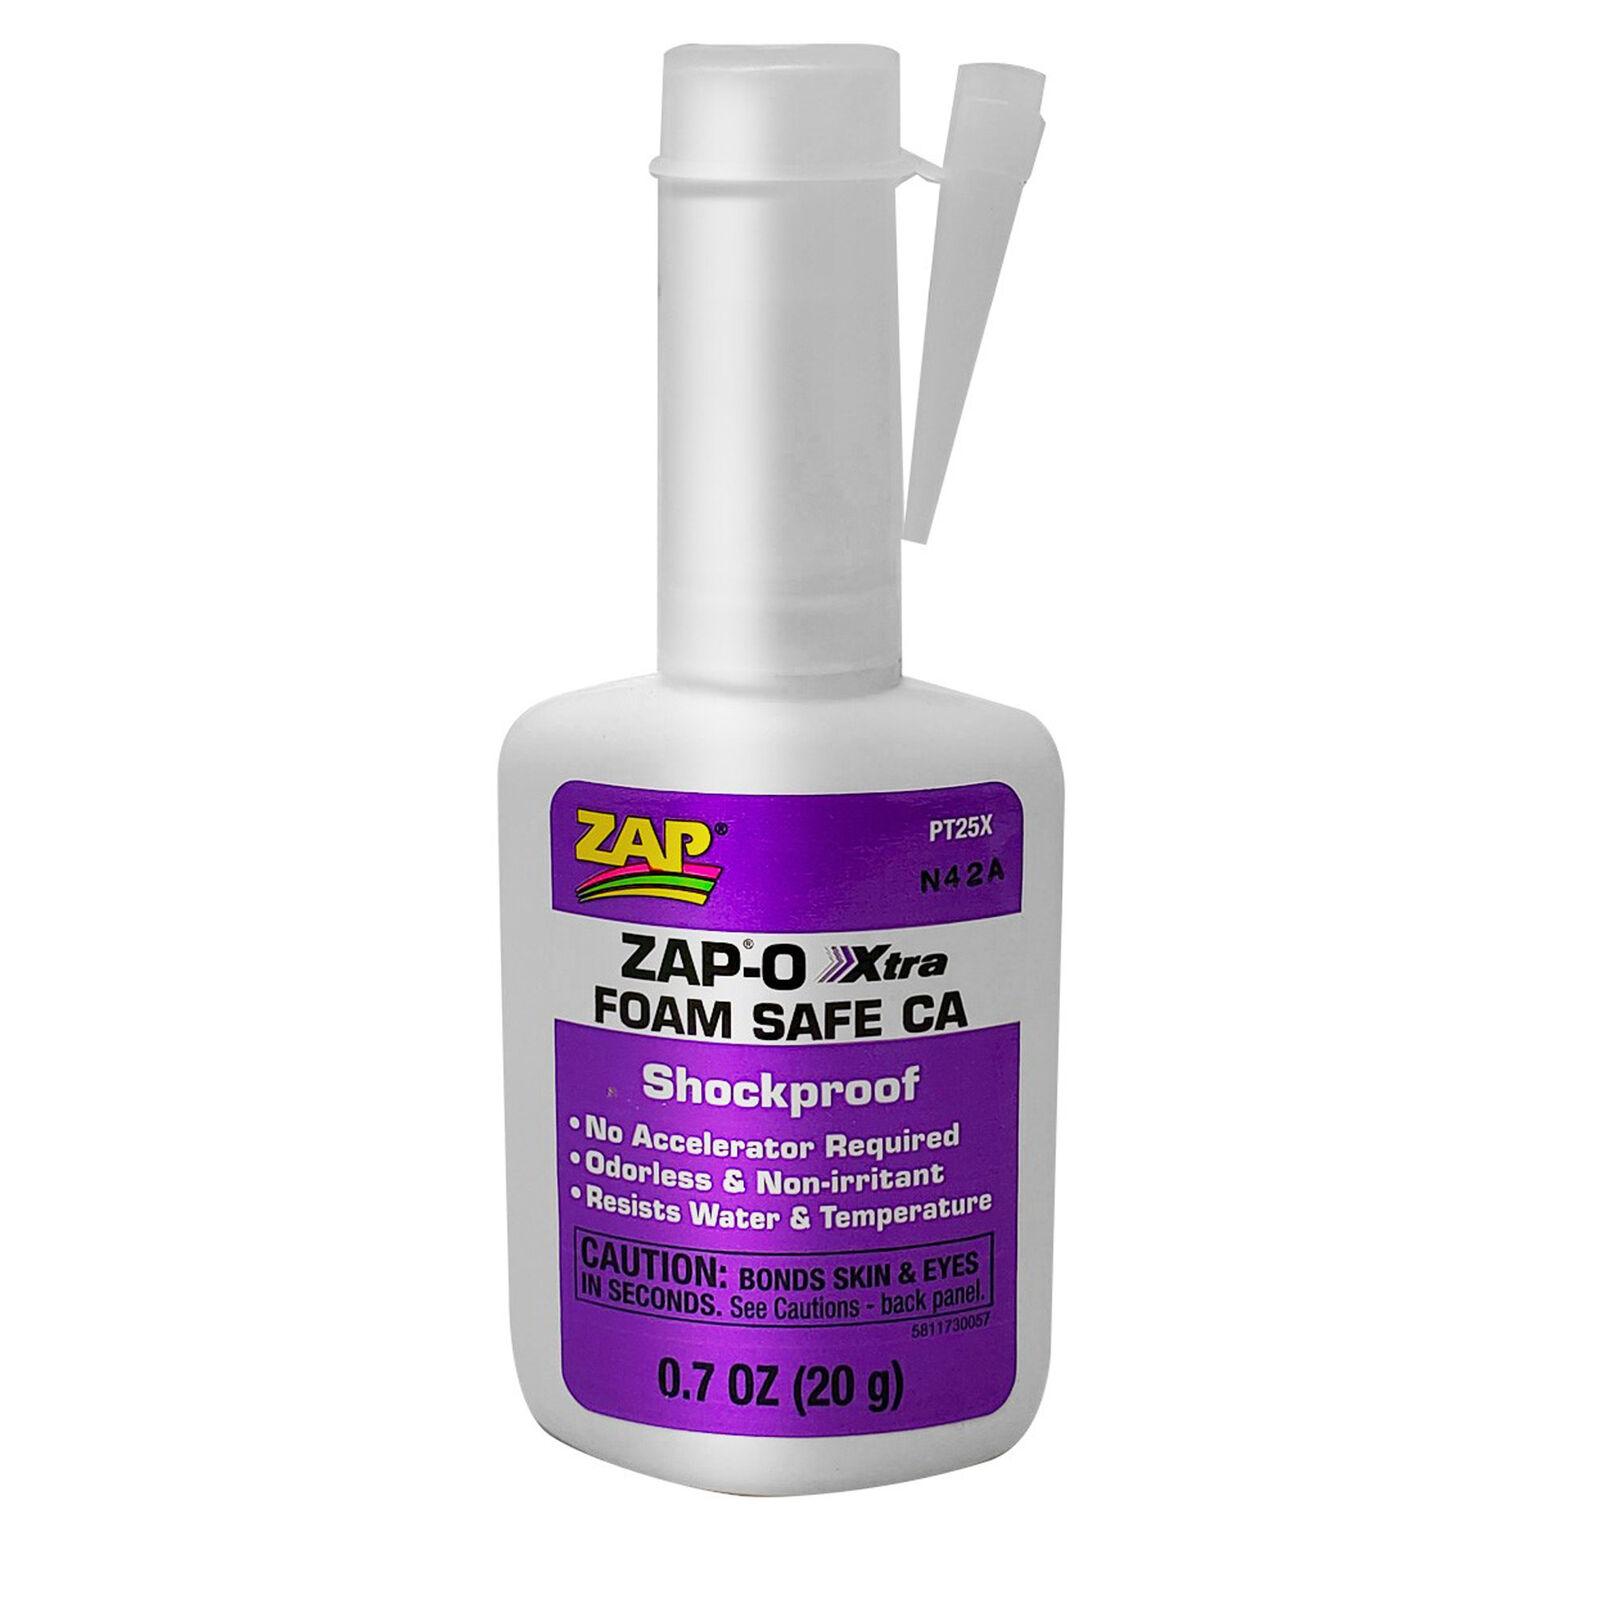 Zap-O Xtra Foam Safe CA Glue, .7 oz